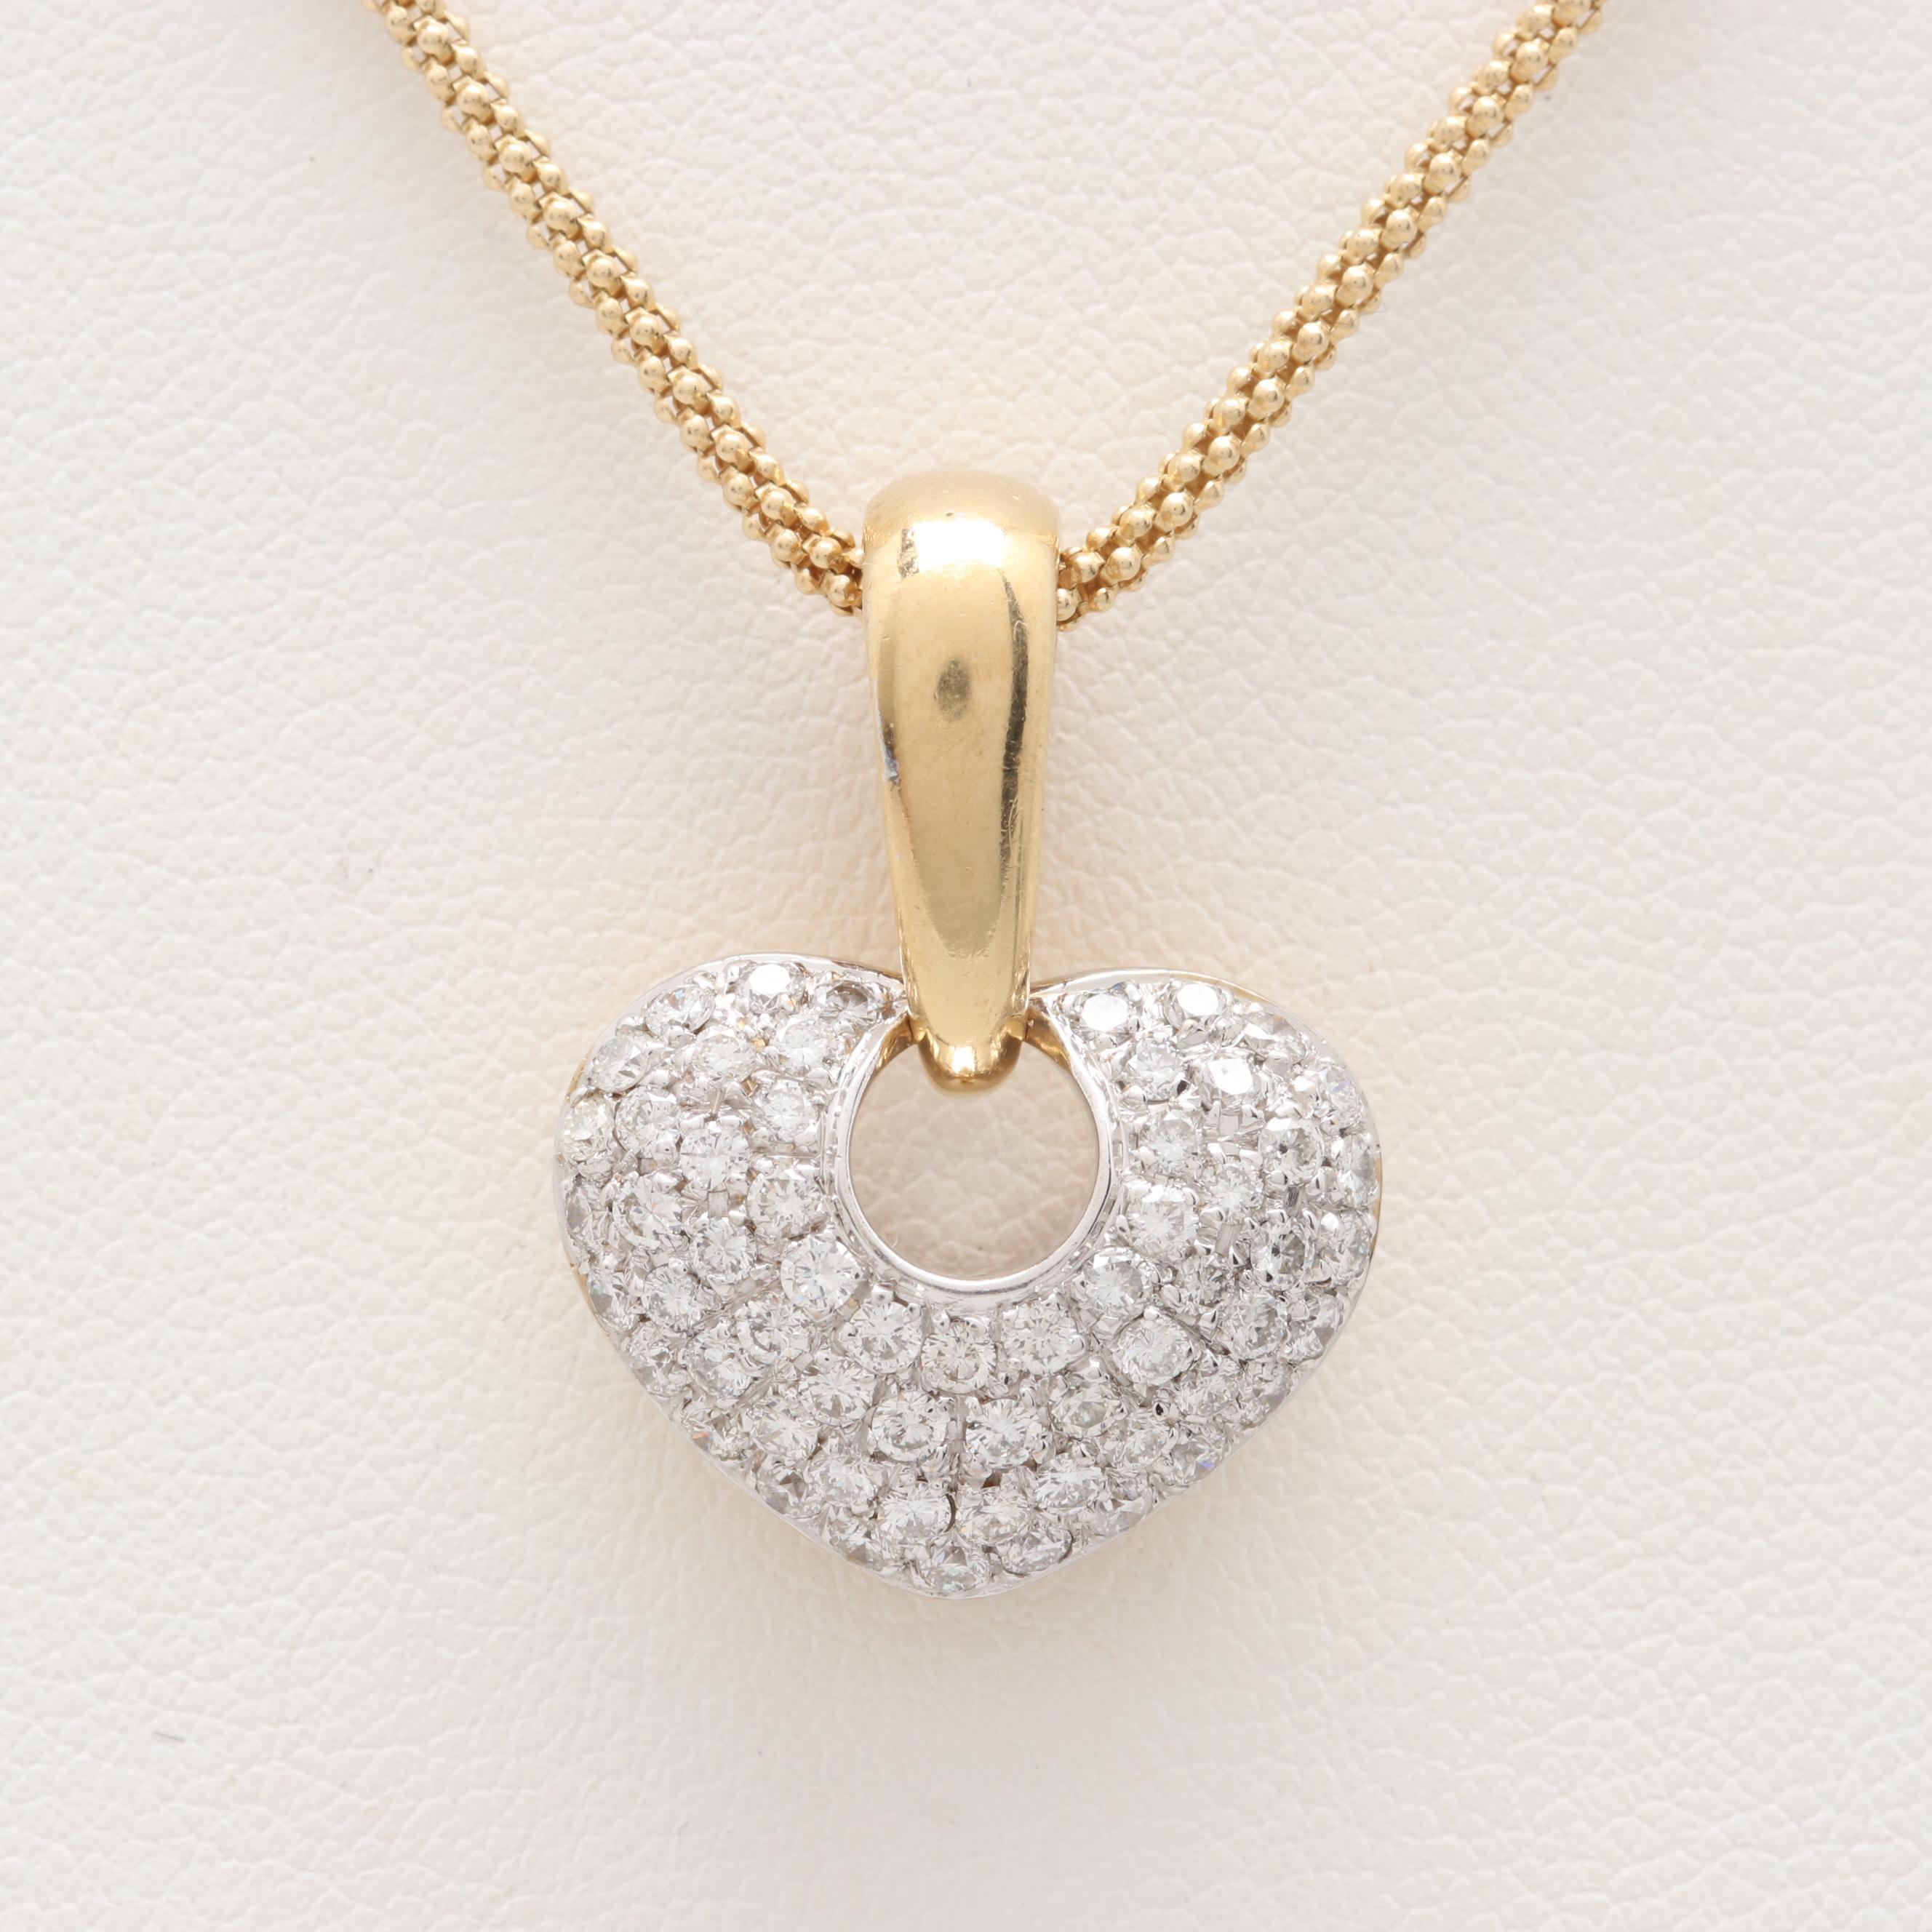 14K and 18K Yellow Gold Diamond Enhancer Pendant Necklace